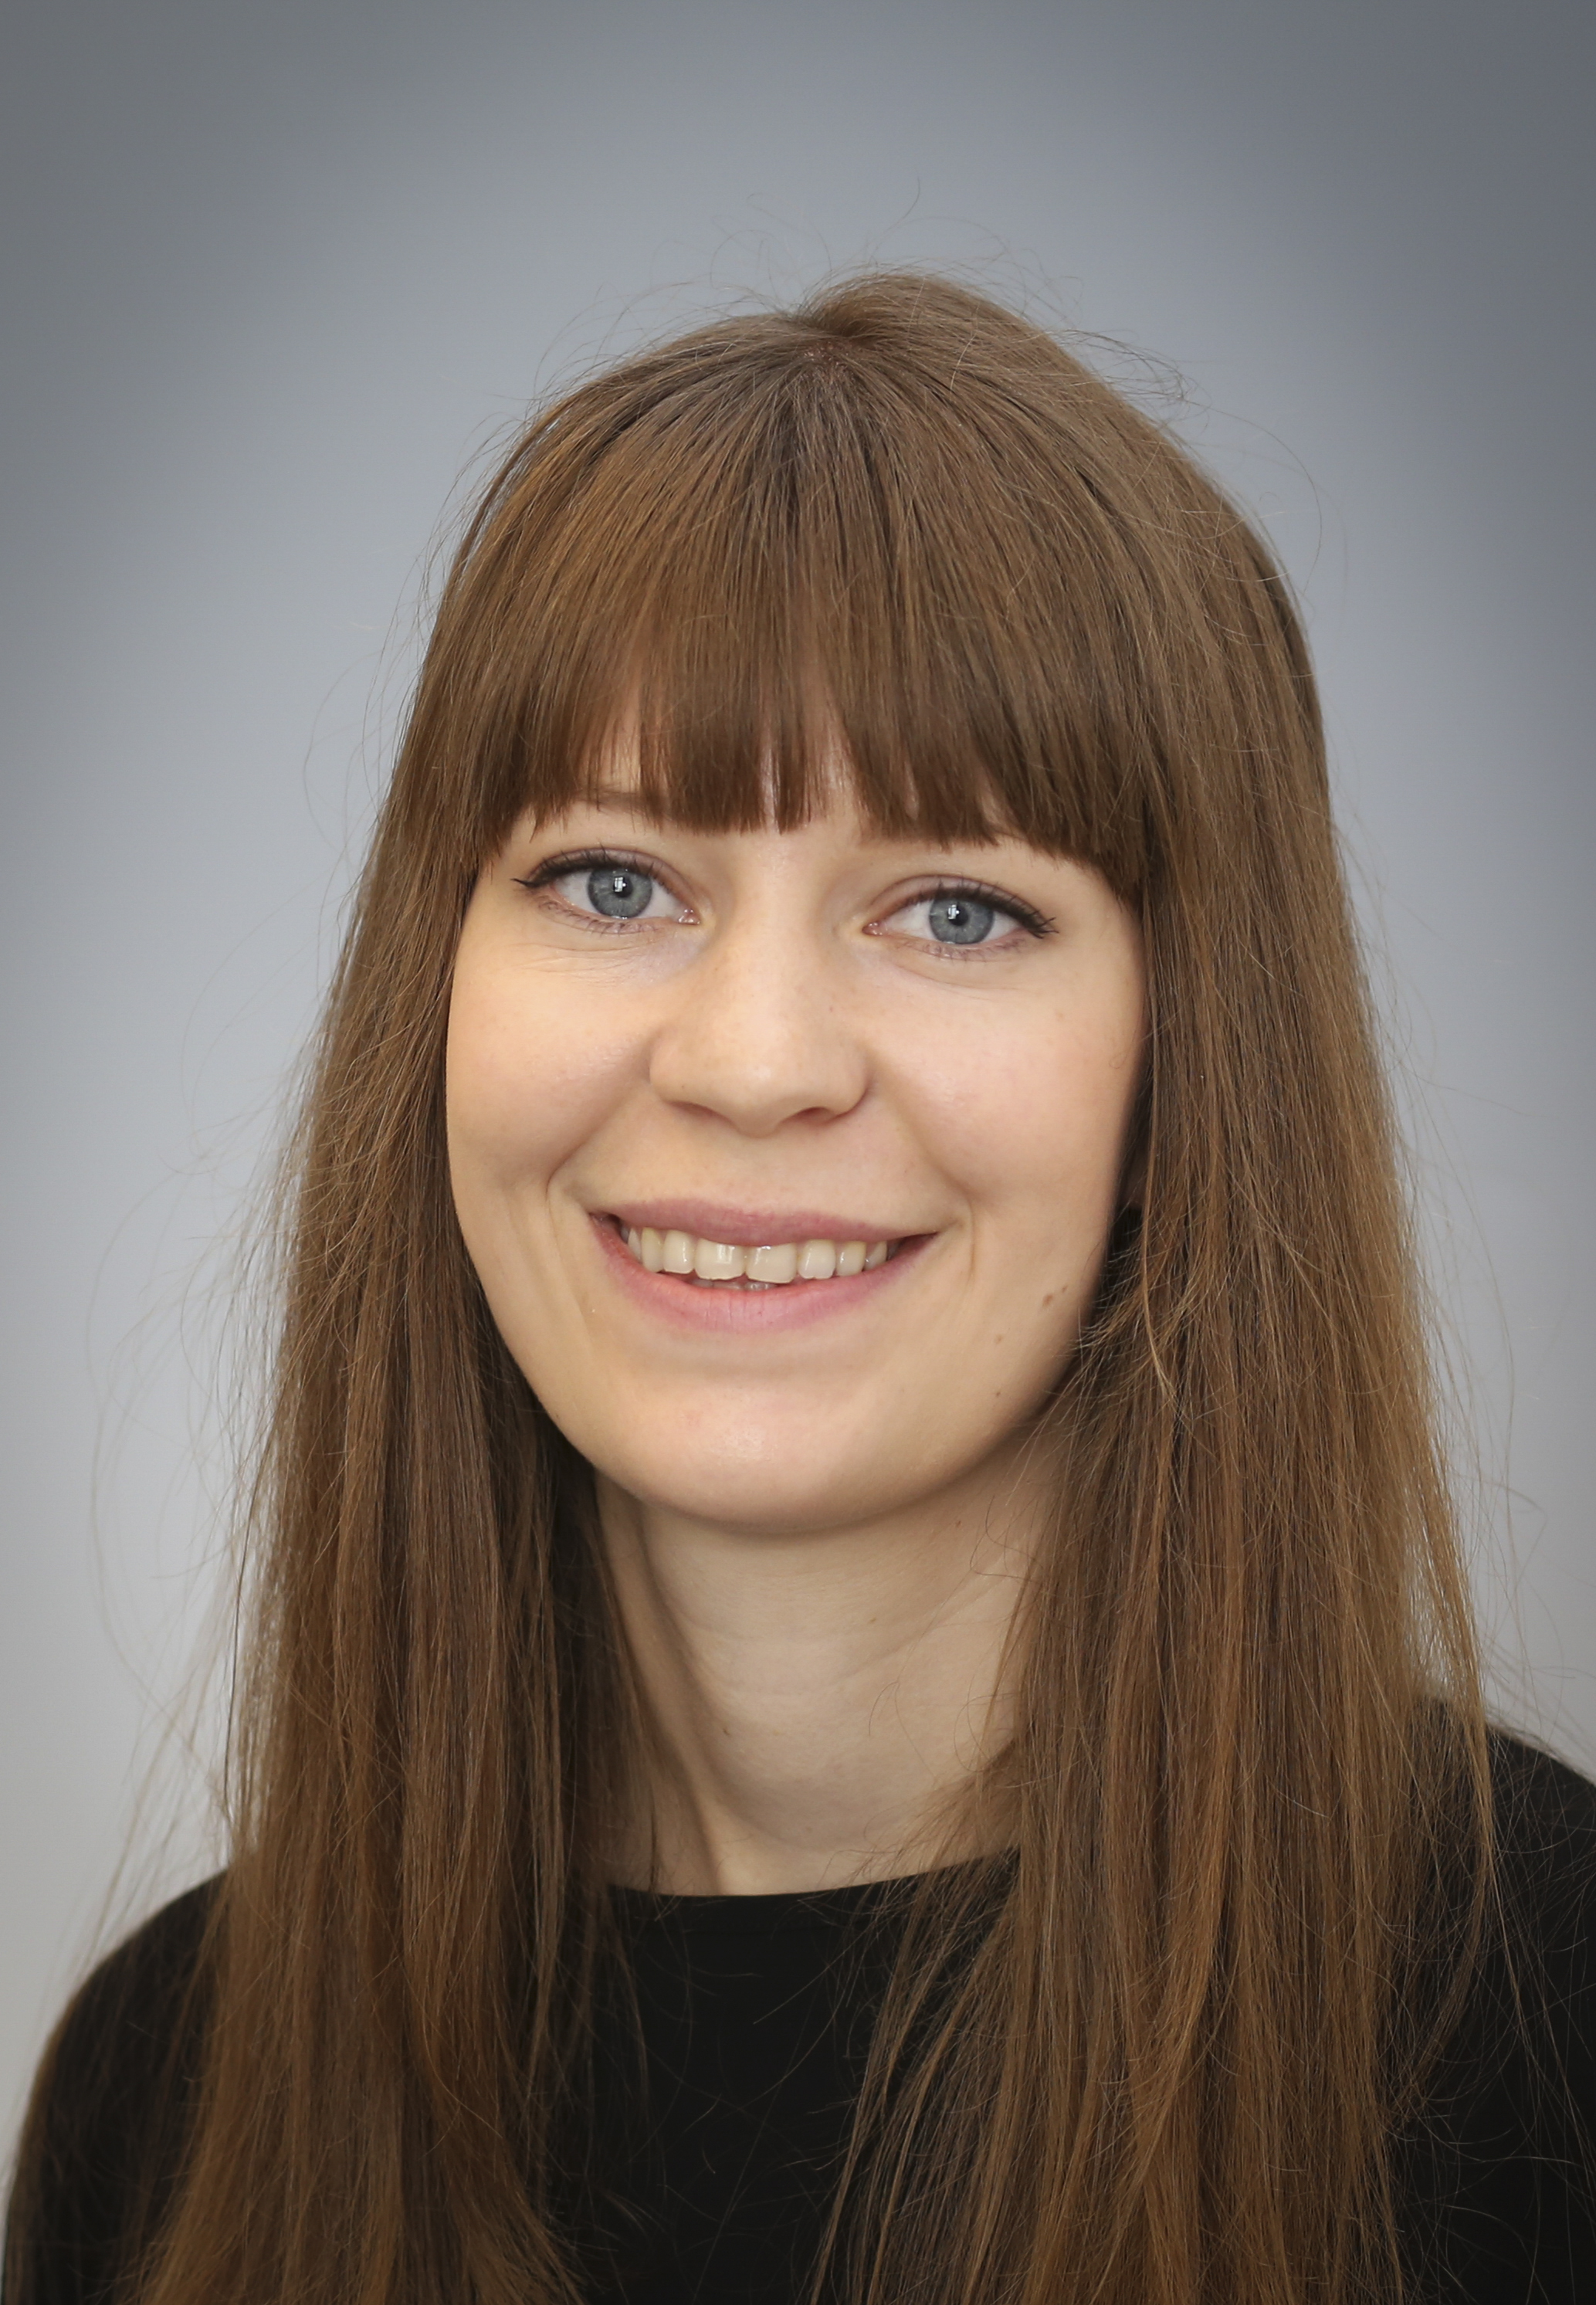 Cecilie Ulfkjær